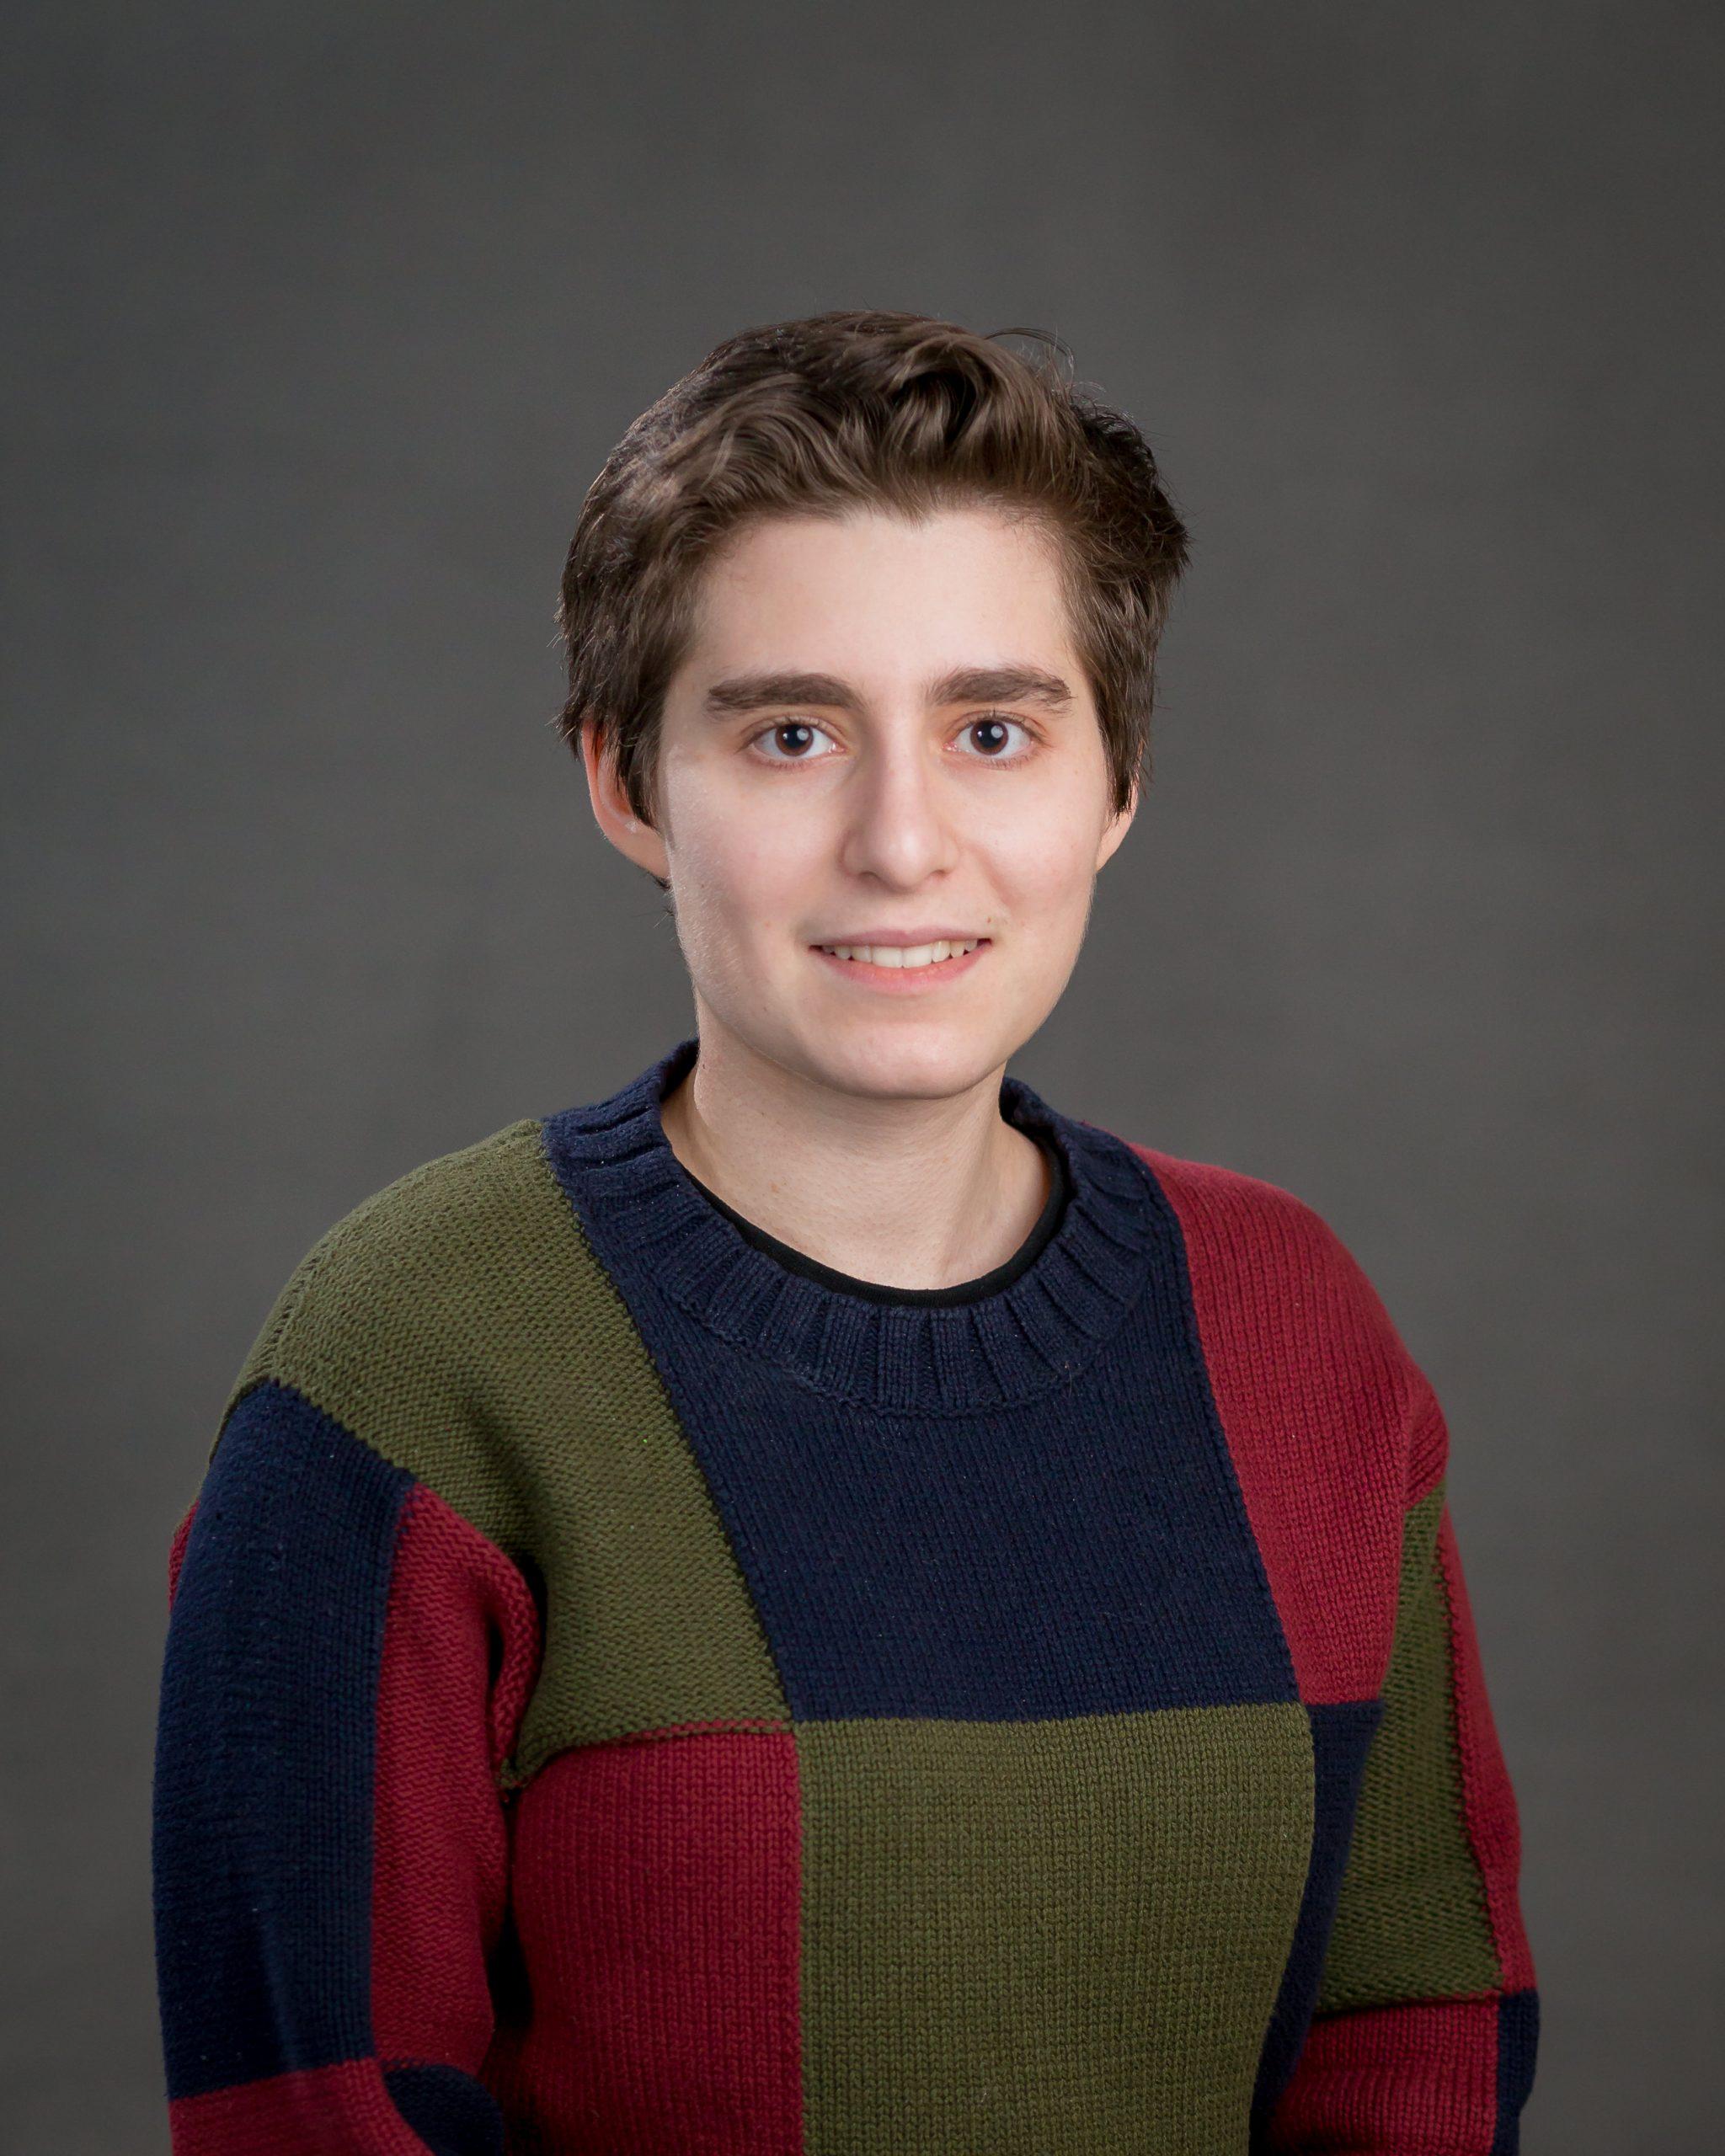 Zarine Kharazian